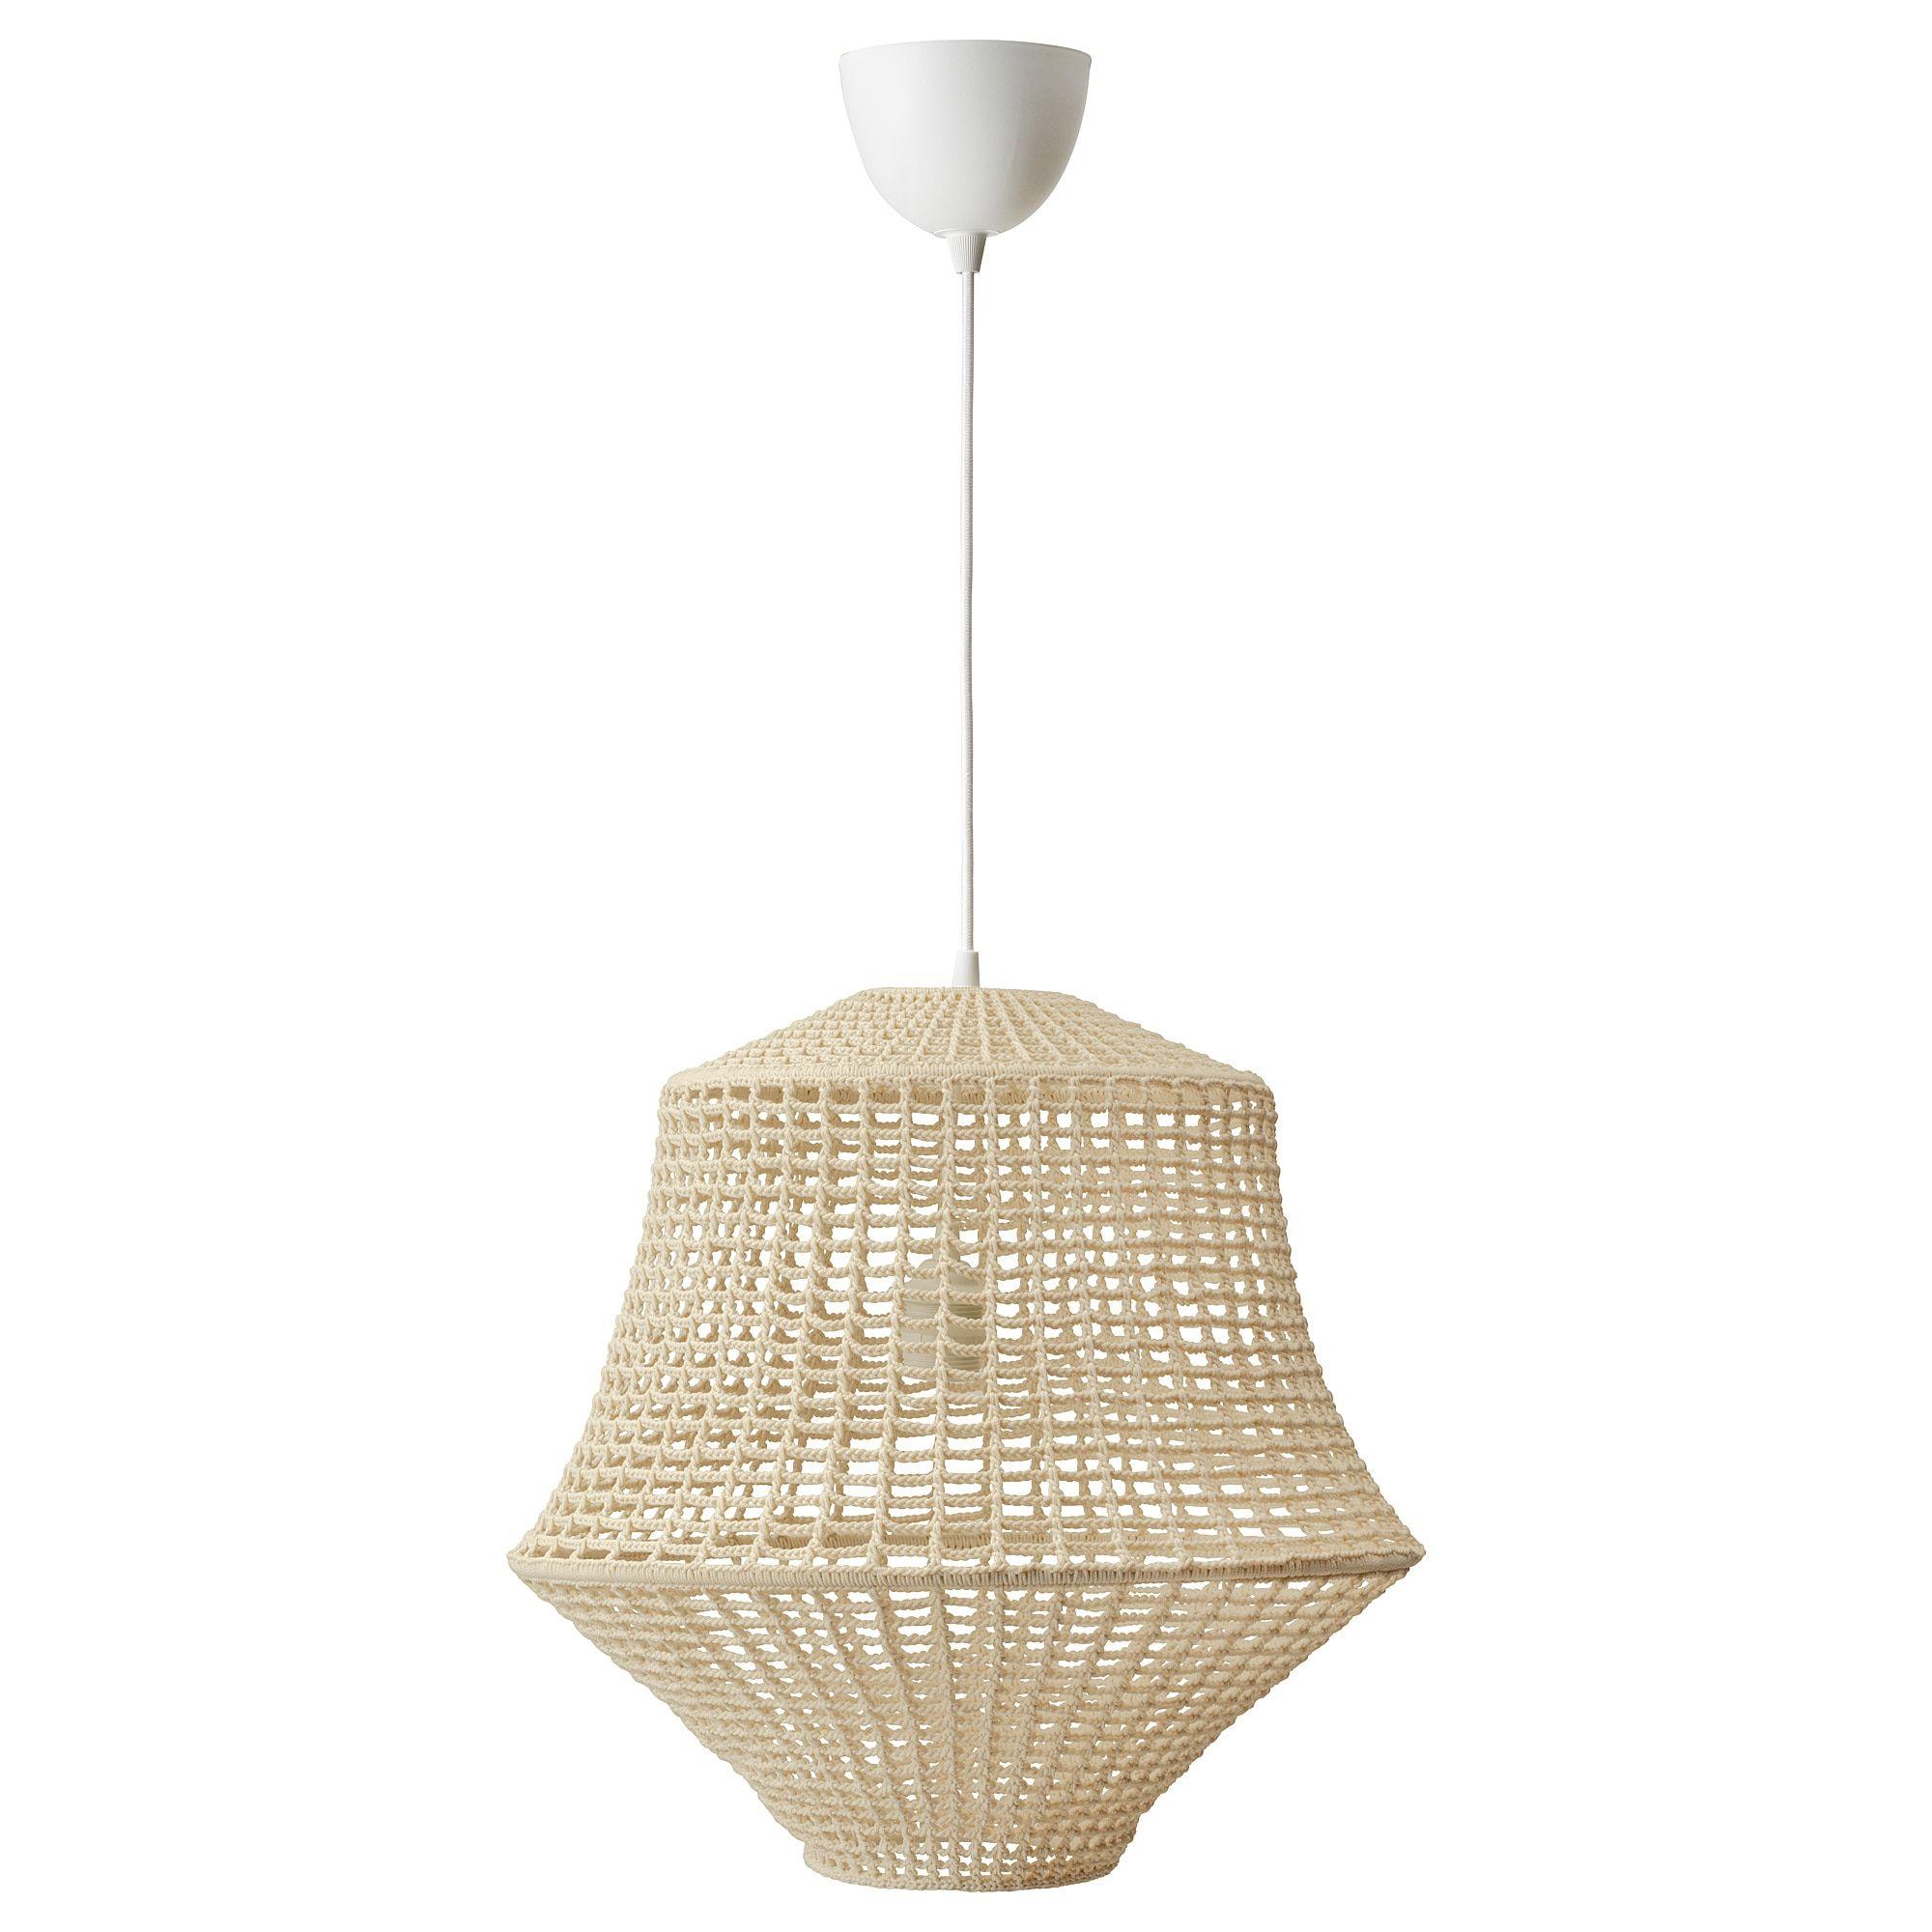 Ikea Us Furniture And Home Furnishings Pendant Lamp Shade Pendant Lamp Plug In Pendant Light